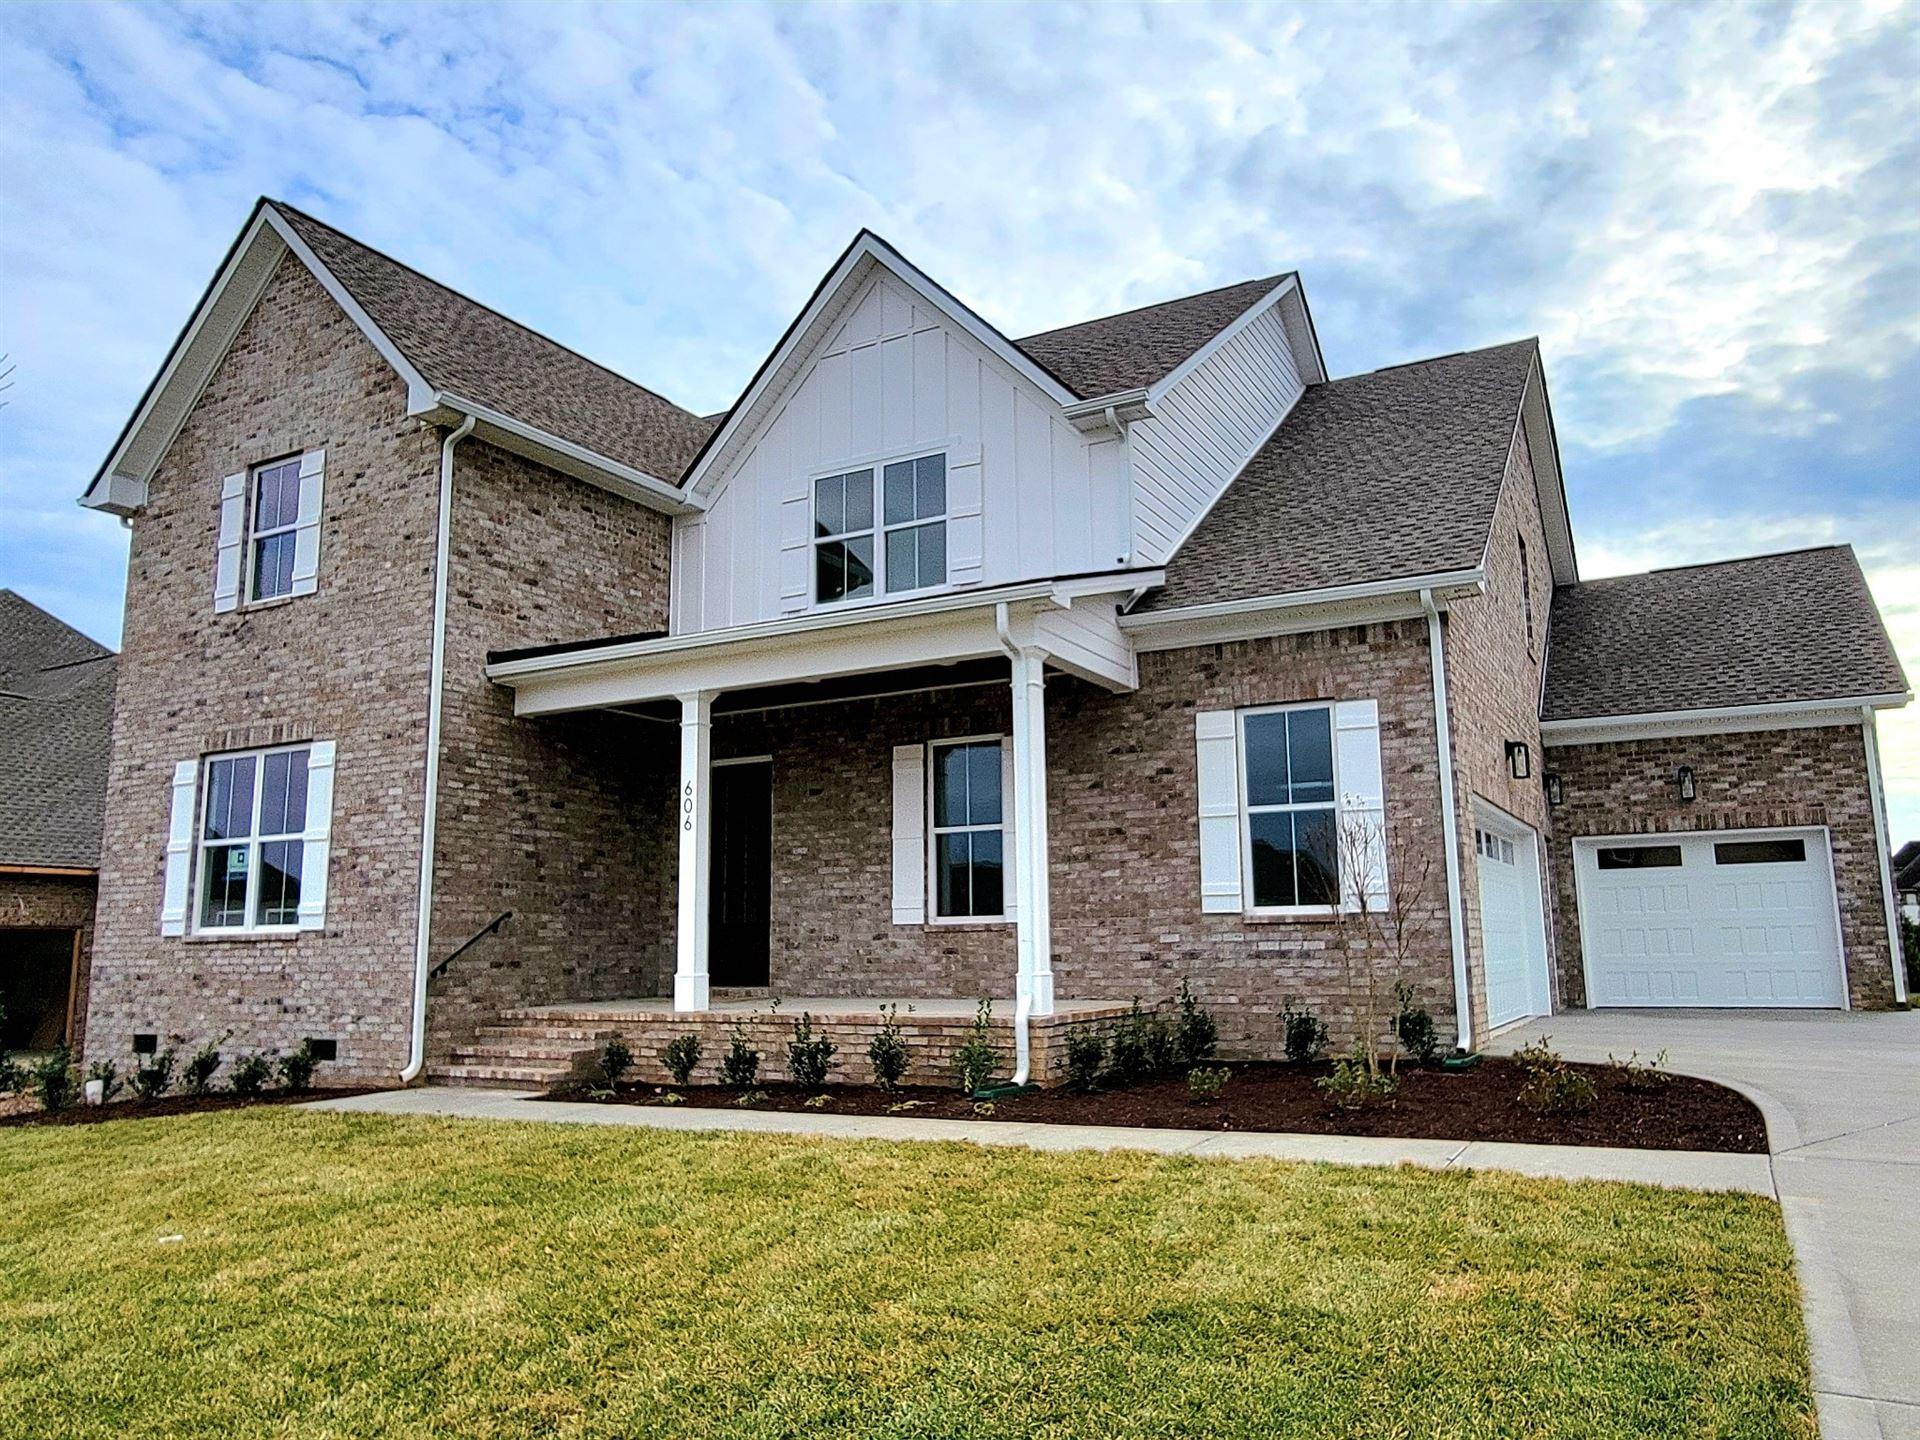 606 Reichert Ct- Lot 194, Murfreesboro, TN 37130 - MLS#: 2276632